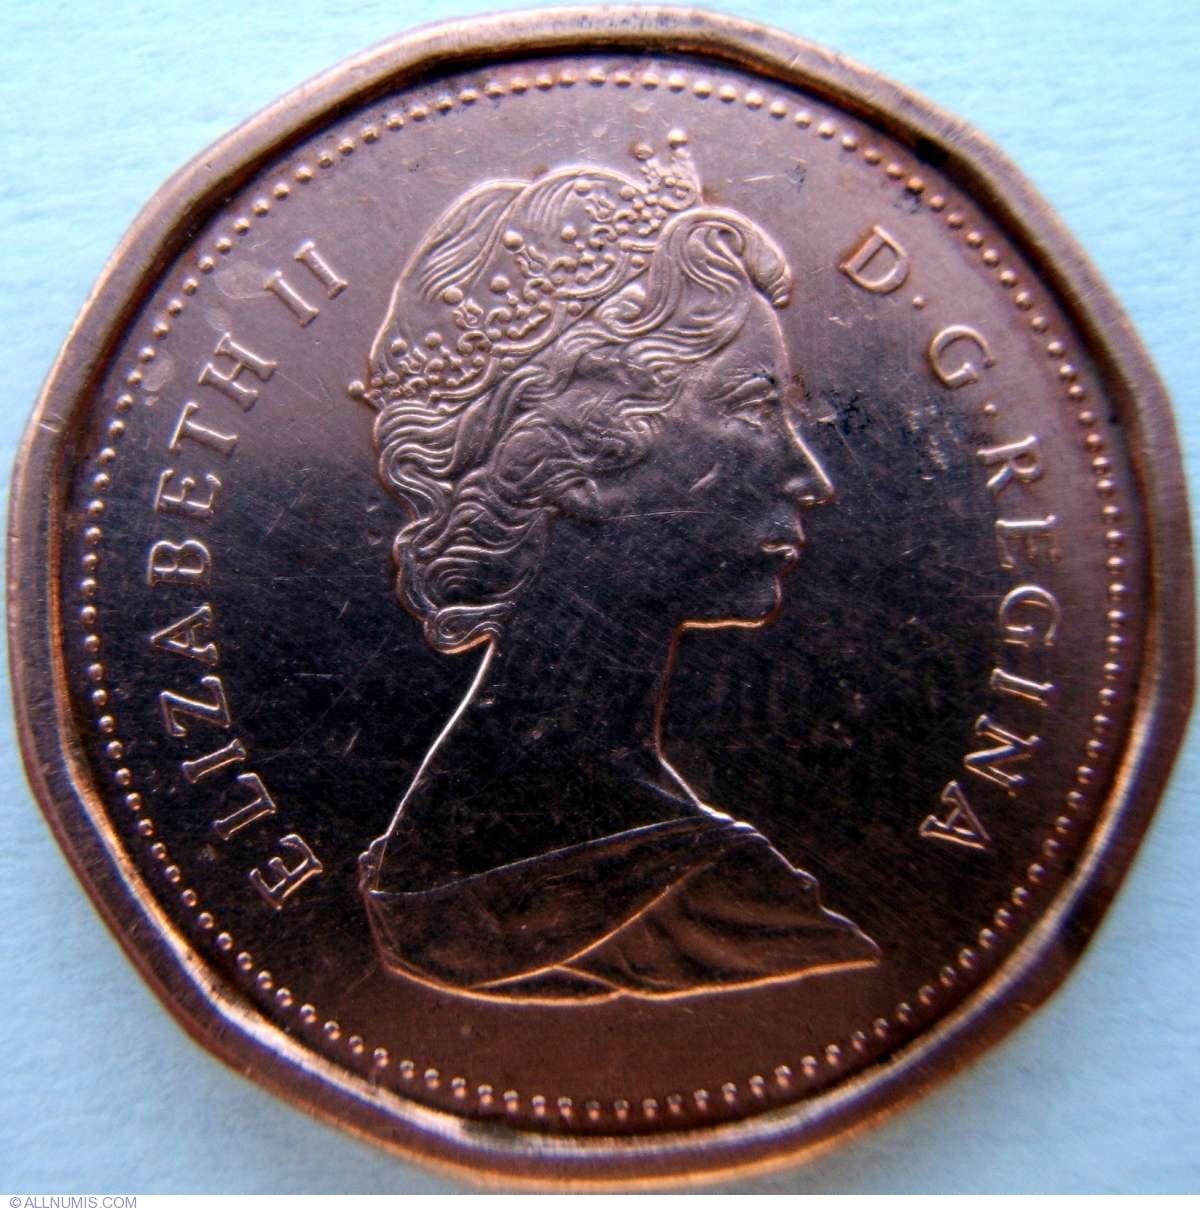 1 Cent 1984 Elizabeth Ii 1953 Present Canada Coin 5491